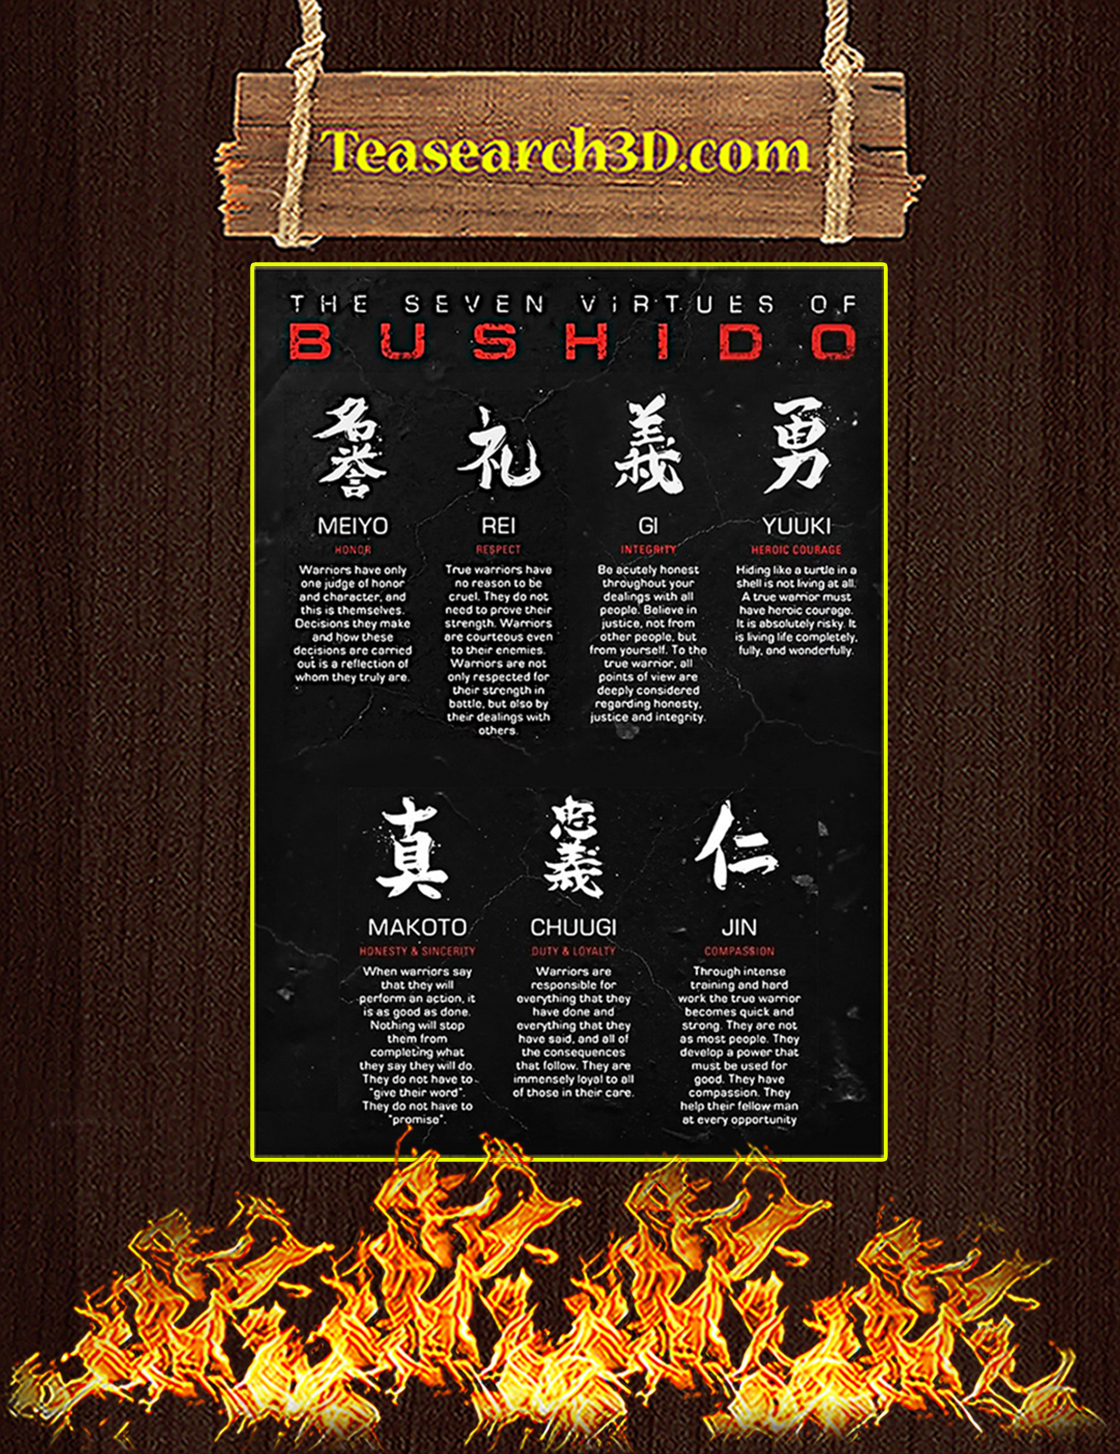 The Seven Virtues Of Bushido Samurai Poster A3